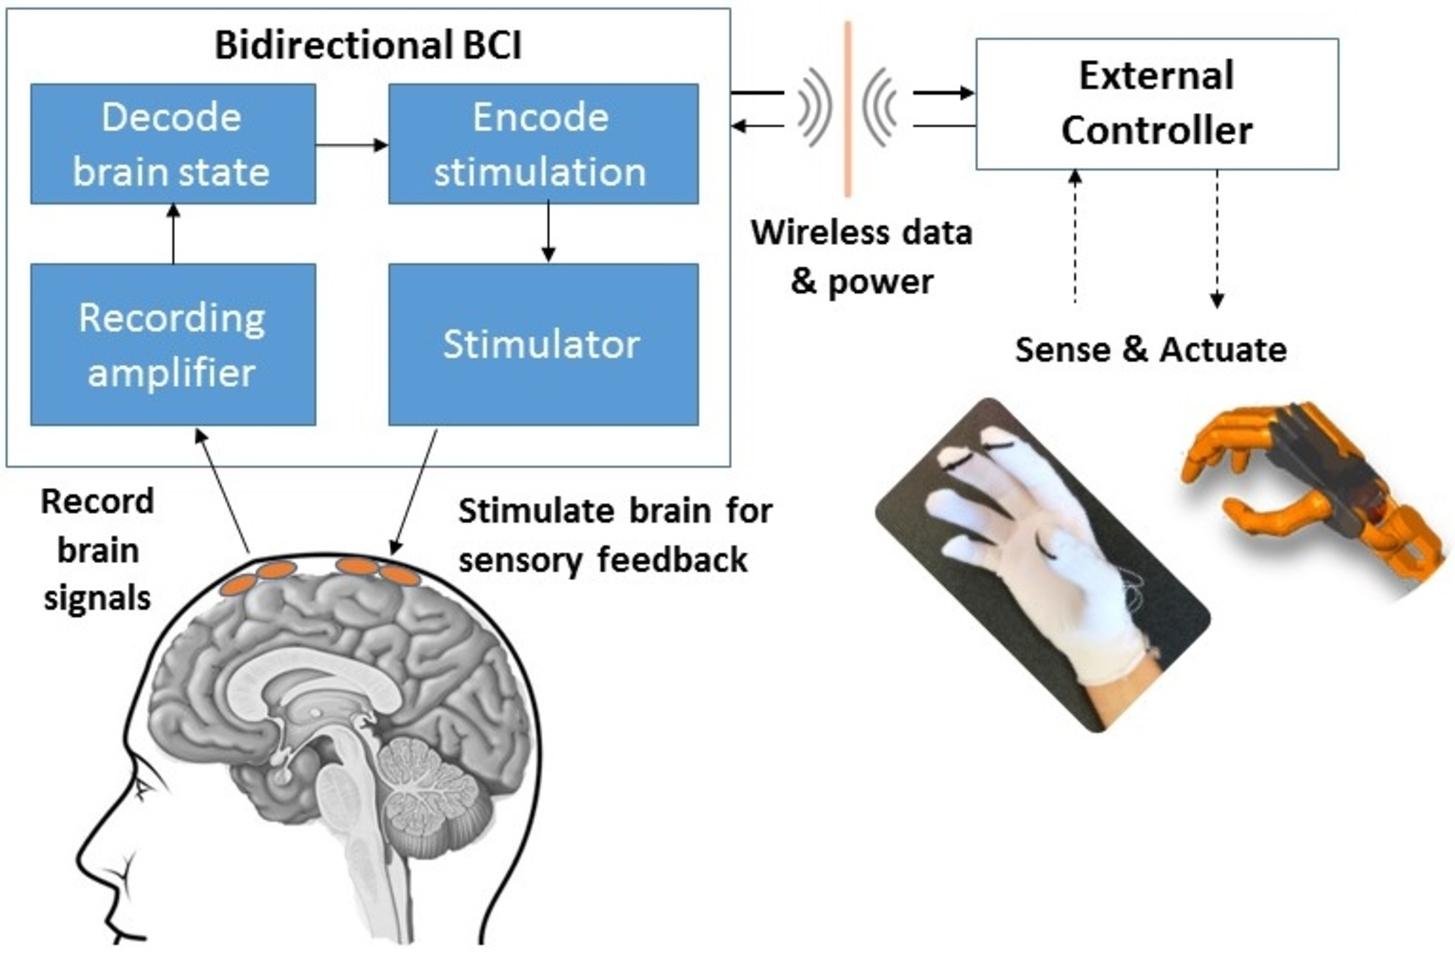 A bidirectional brain-computer interface